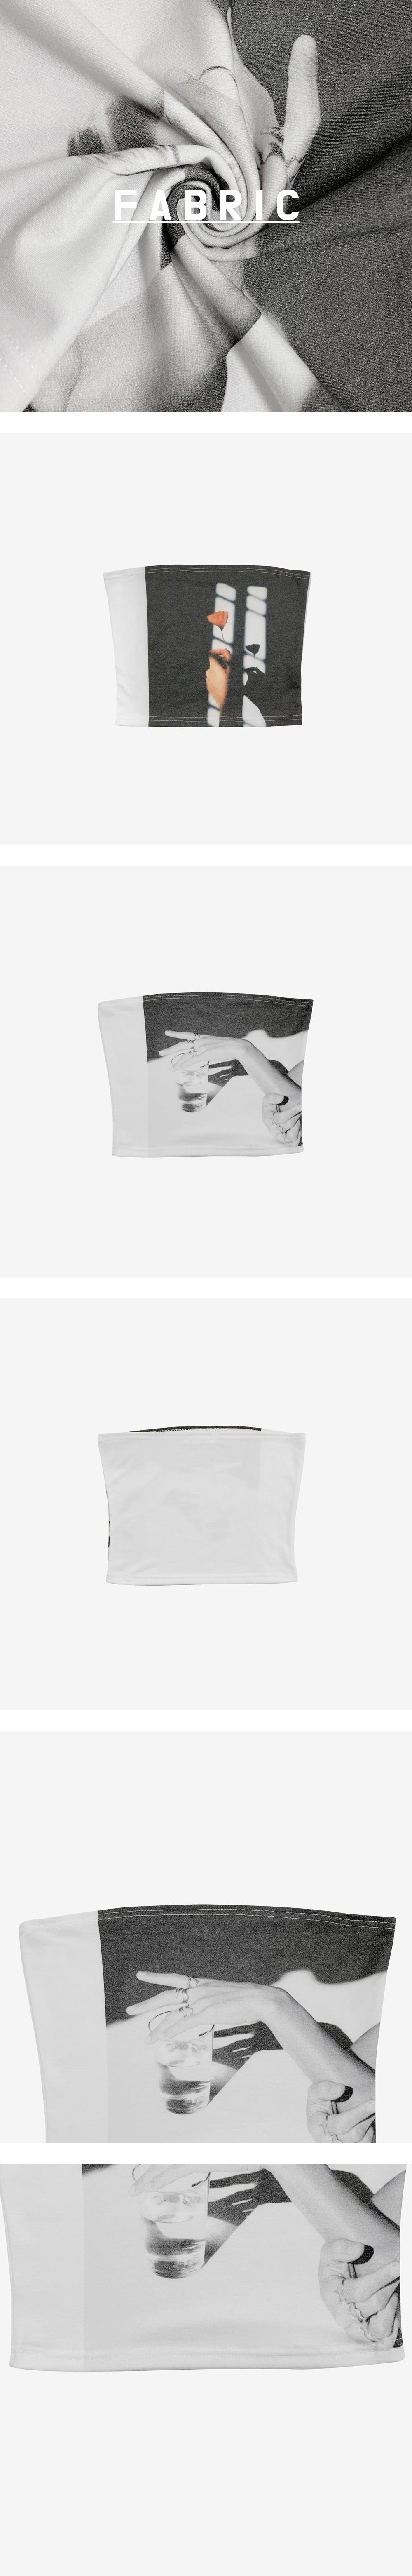 world print tube top